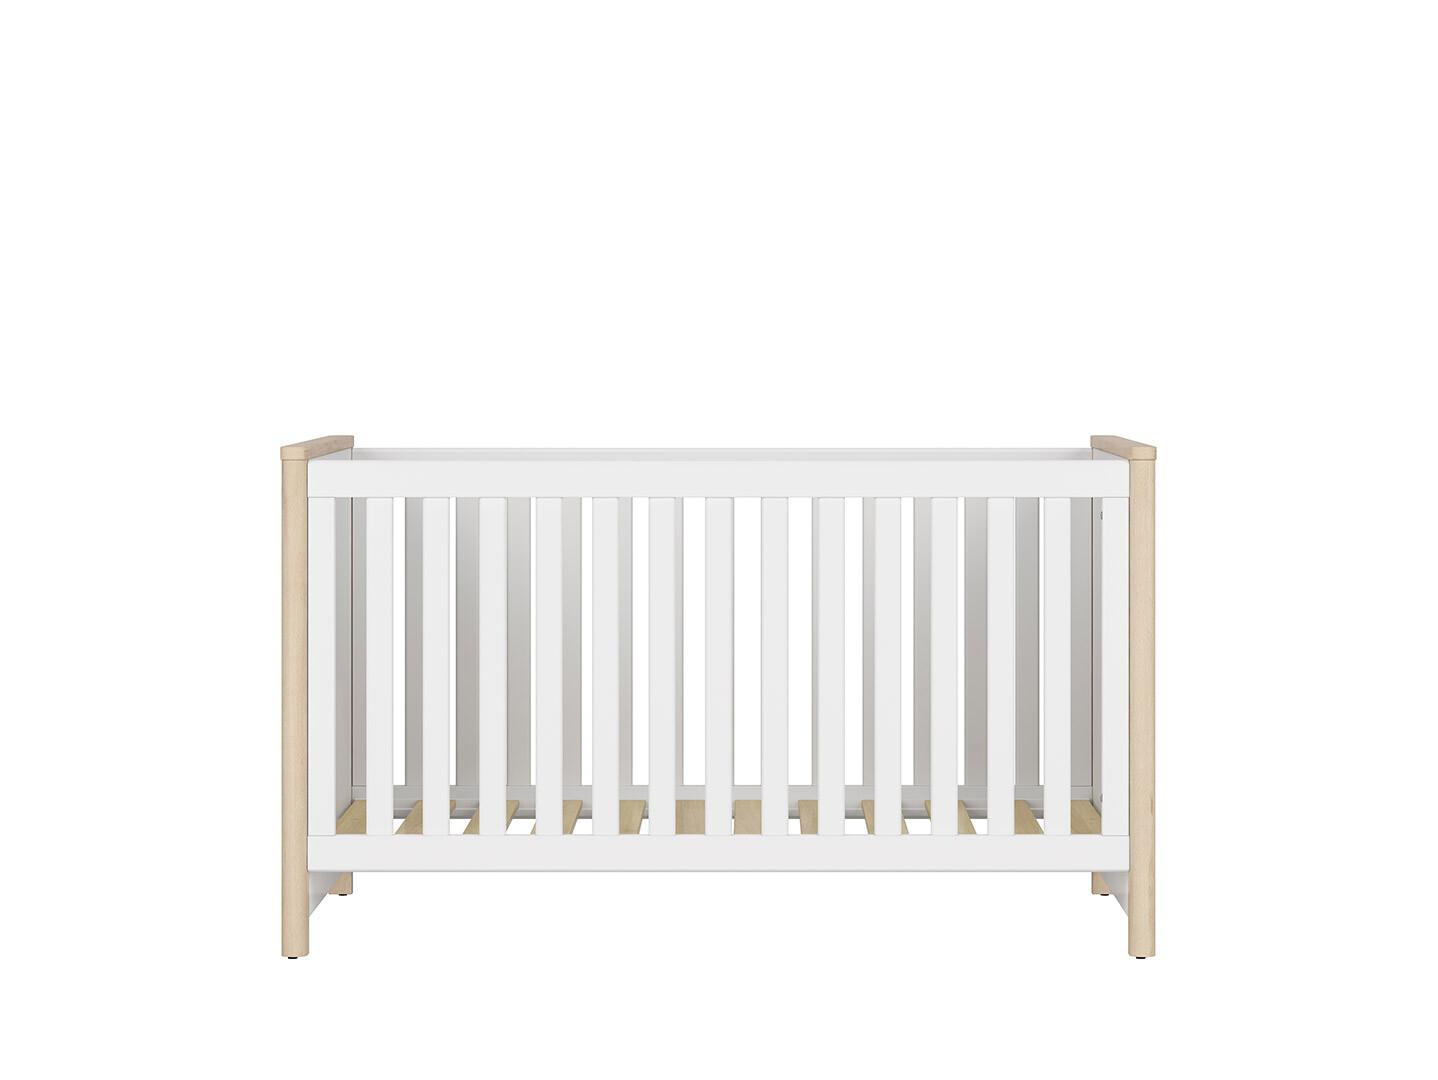 Detská postel TIMON LOZ/140x70 buk iconic/ biela/ koníky